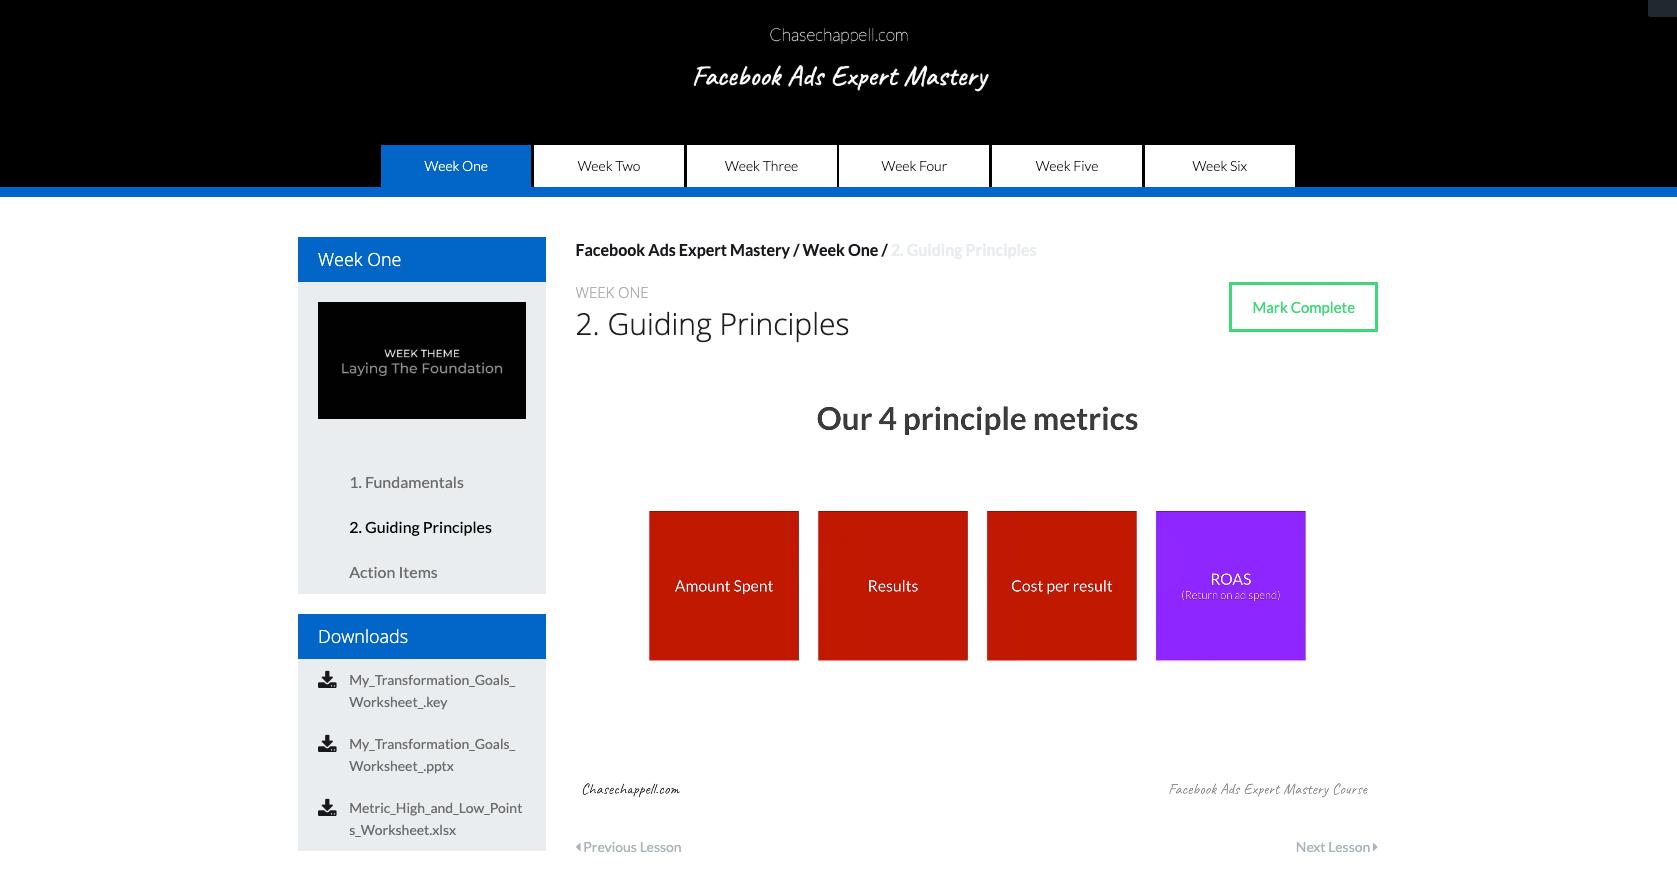 Facebook Ad 4 principle metrics